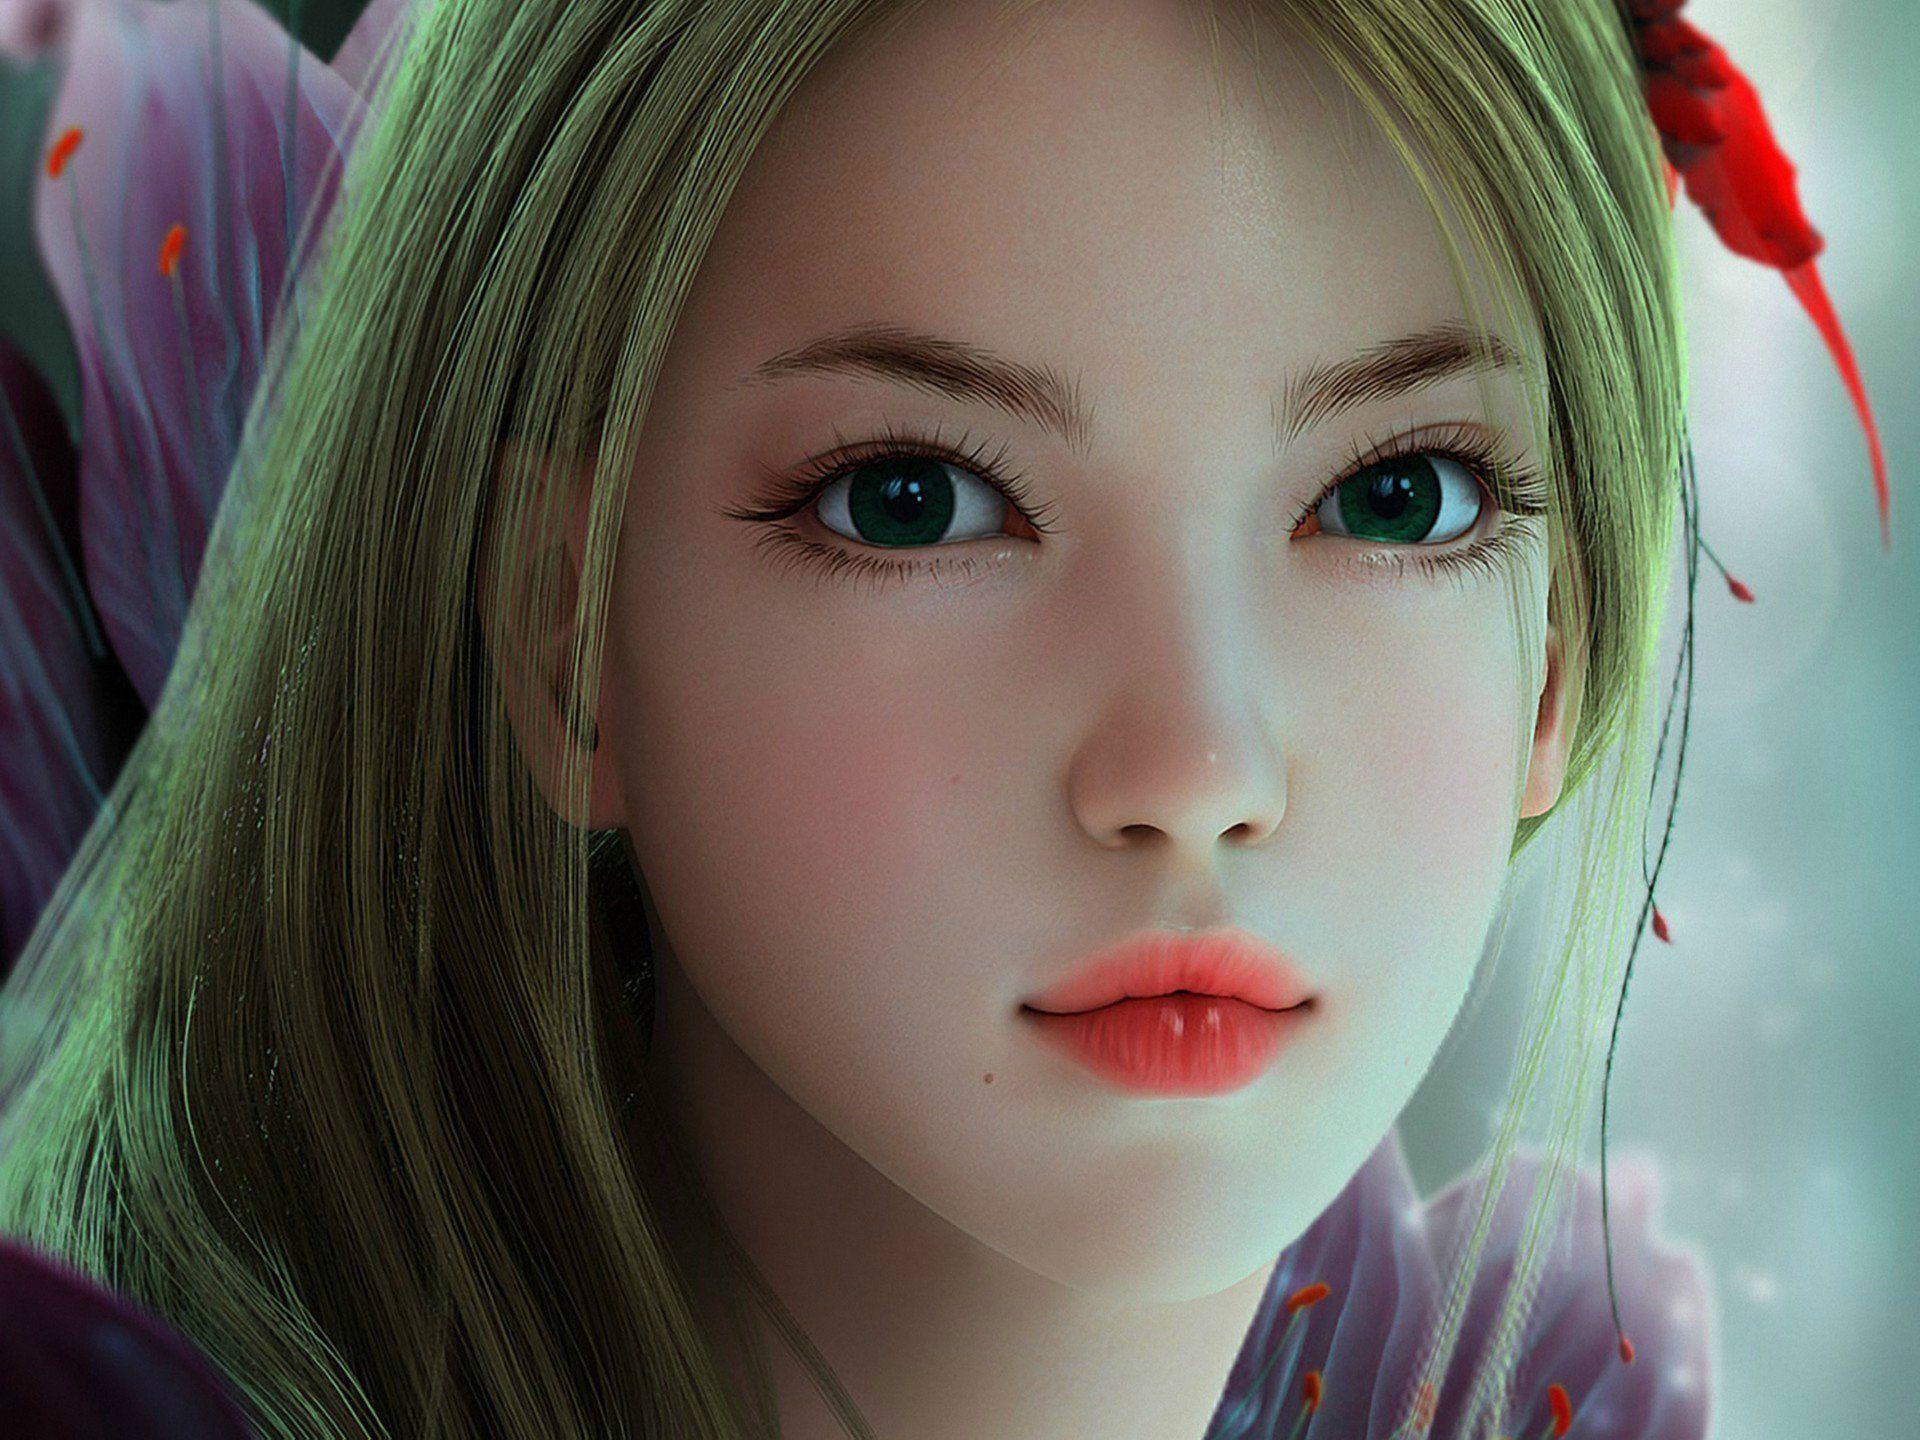 beautiful-girl-face-free-desktop-wallpaper-1920×1440-beauty